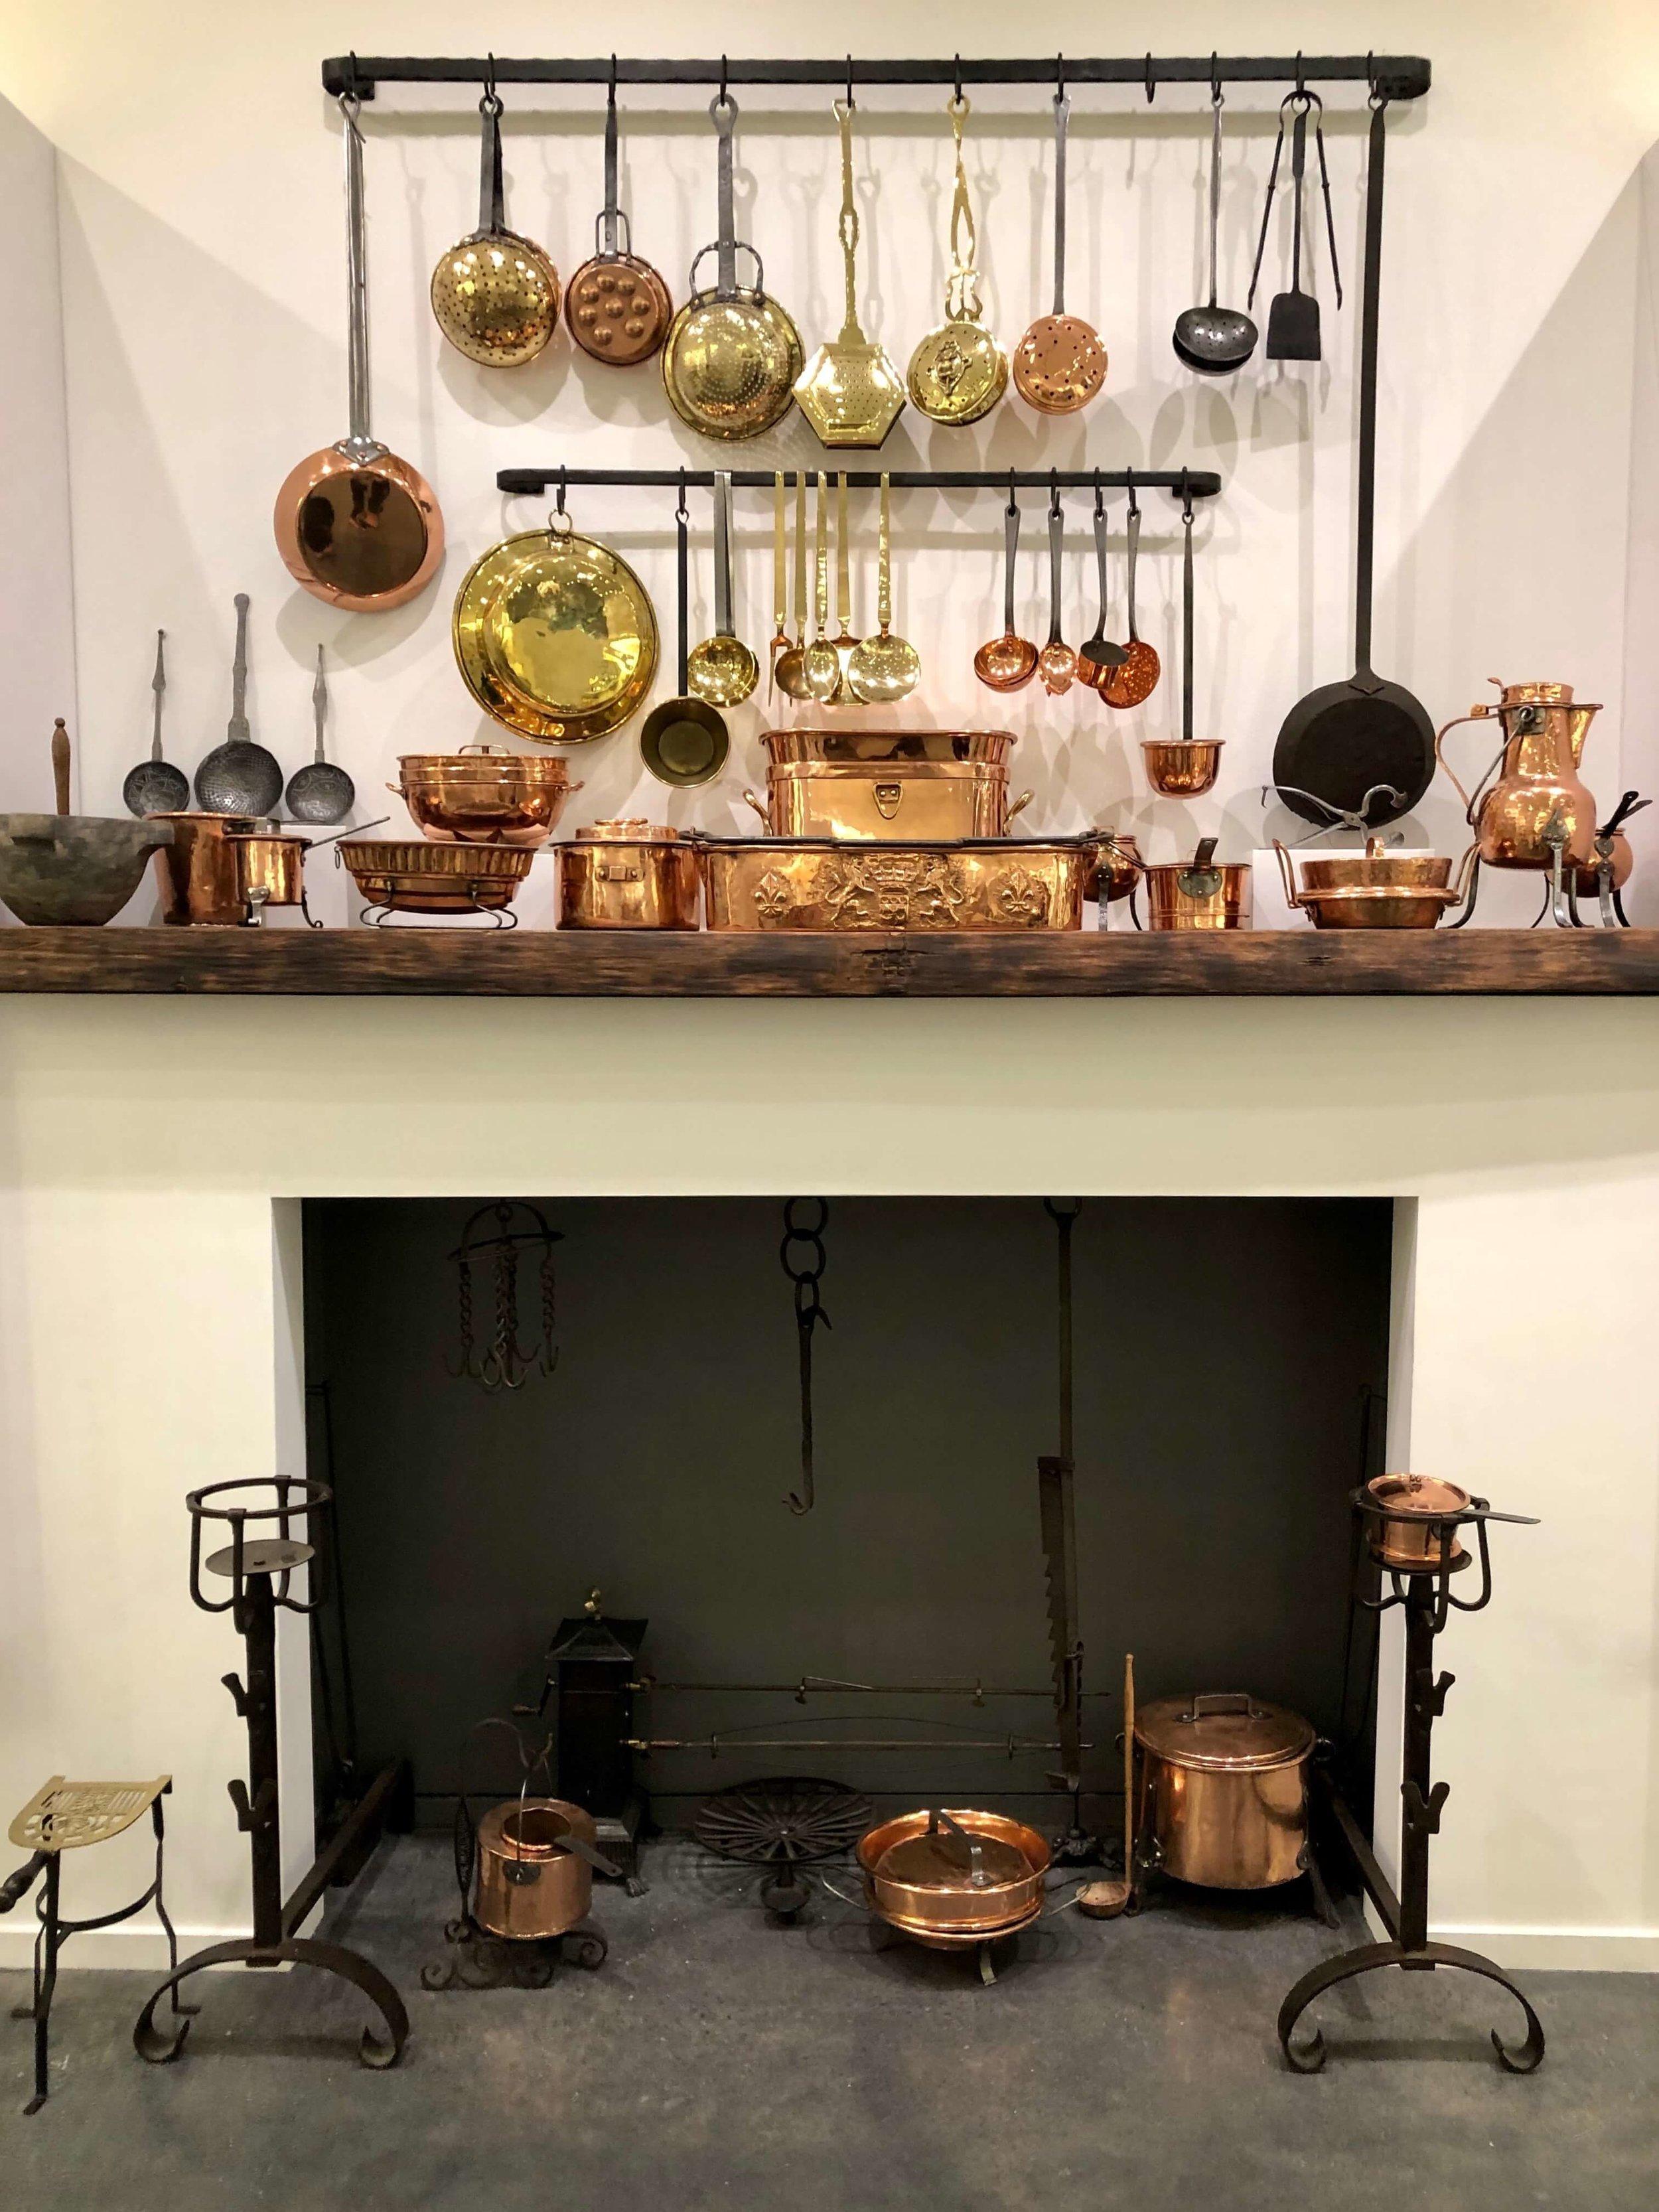 Antique copper cookware at the Chuck Williams Culinary Arts Museum, Culinary Institute of America Copia | Napa, California